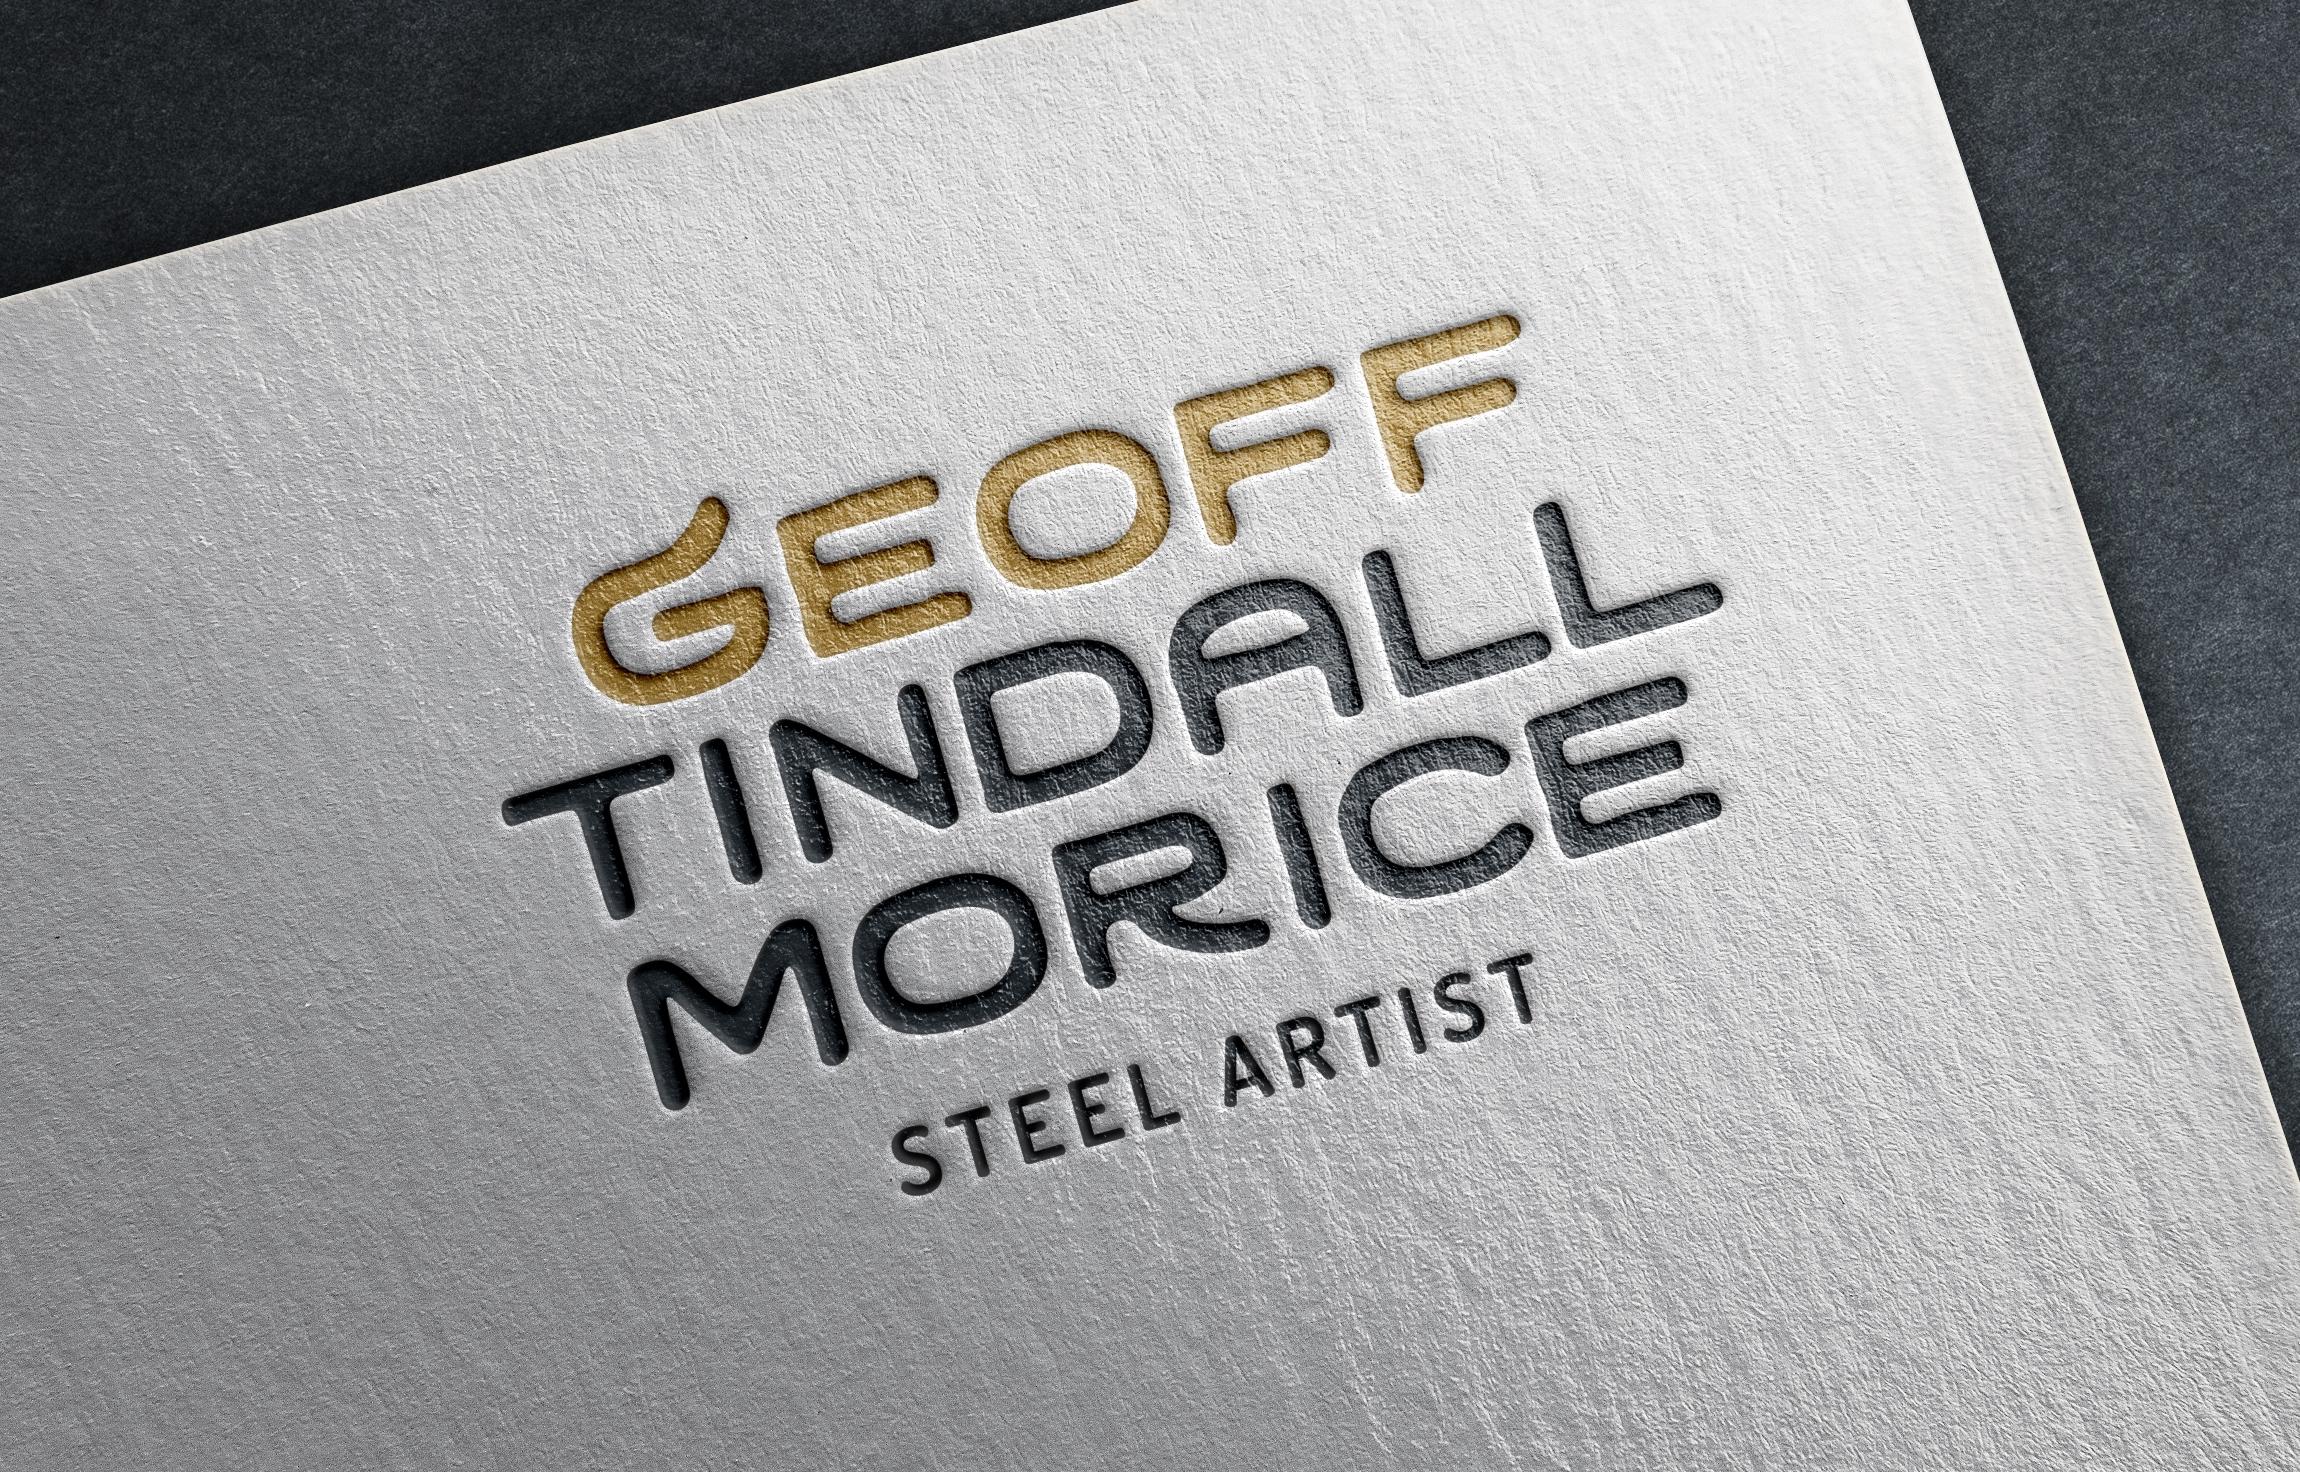 Geoff Tindall Morice